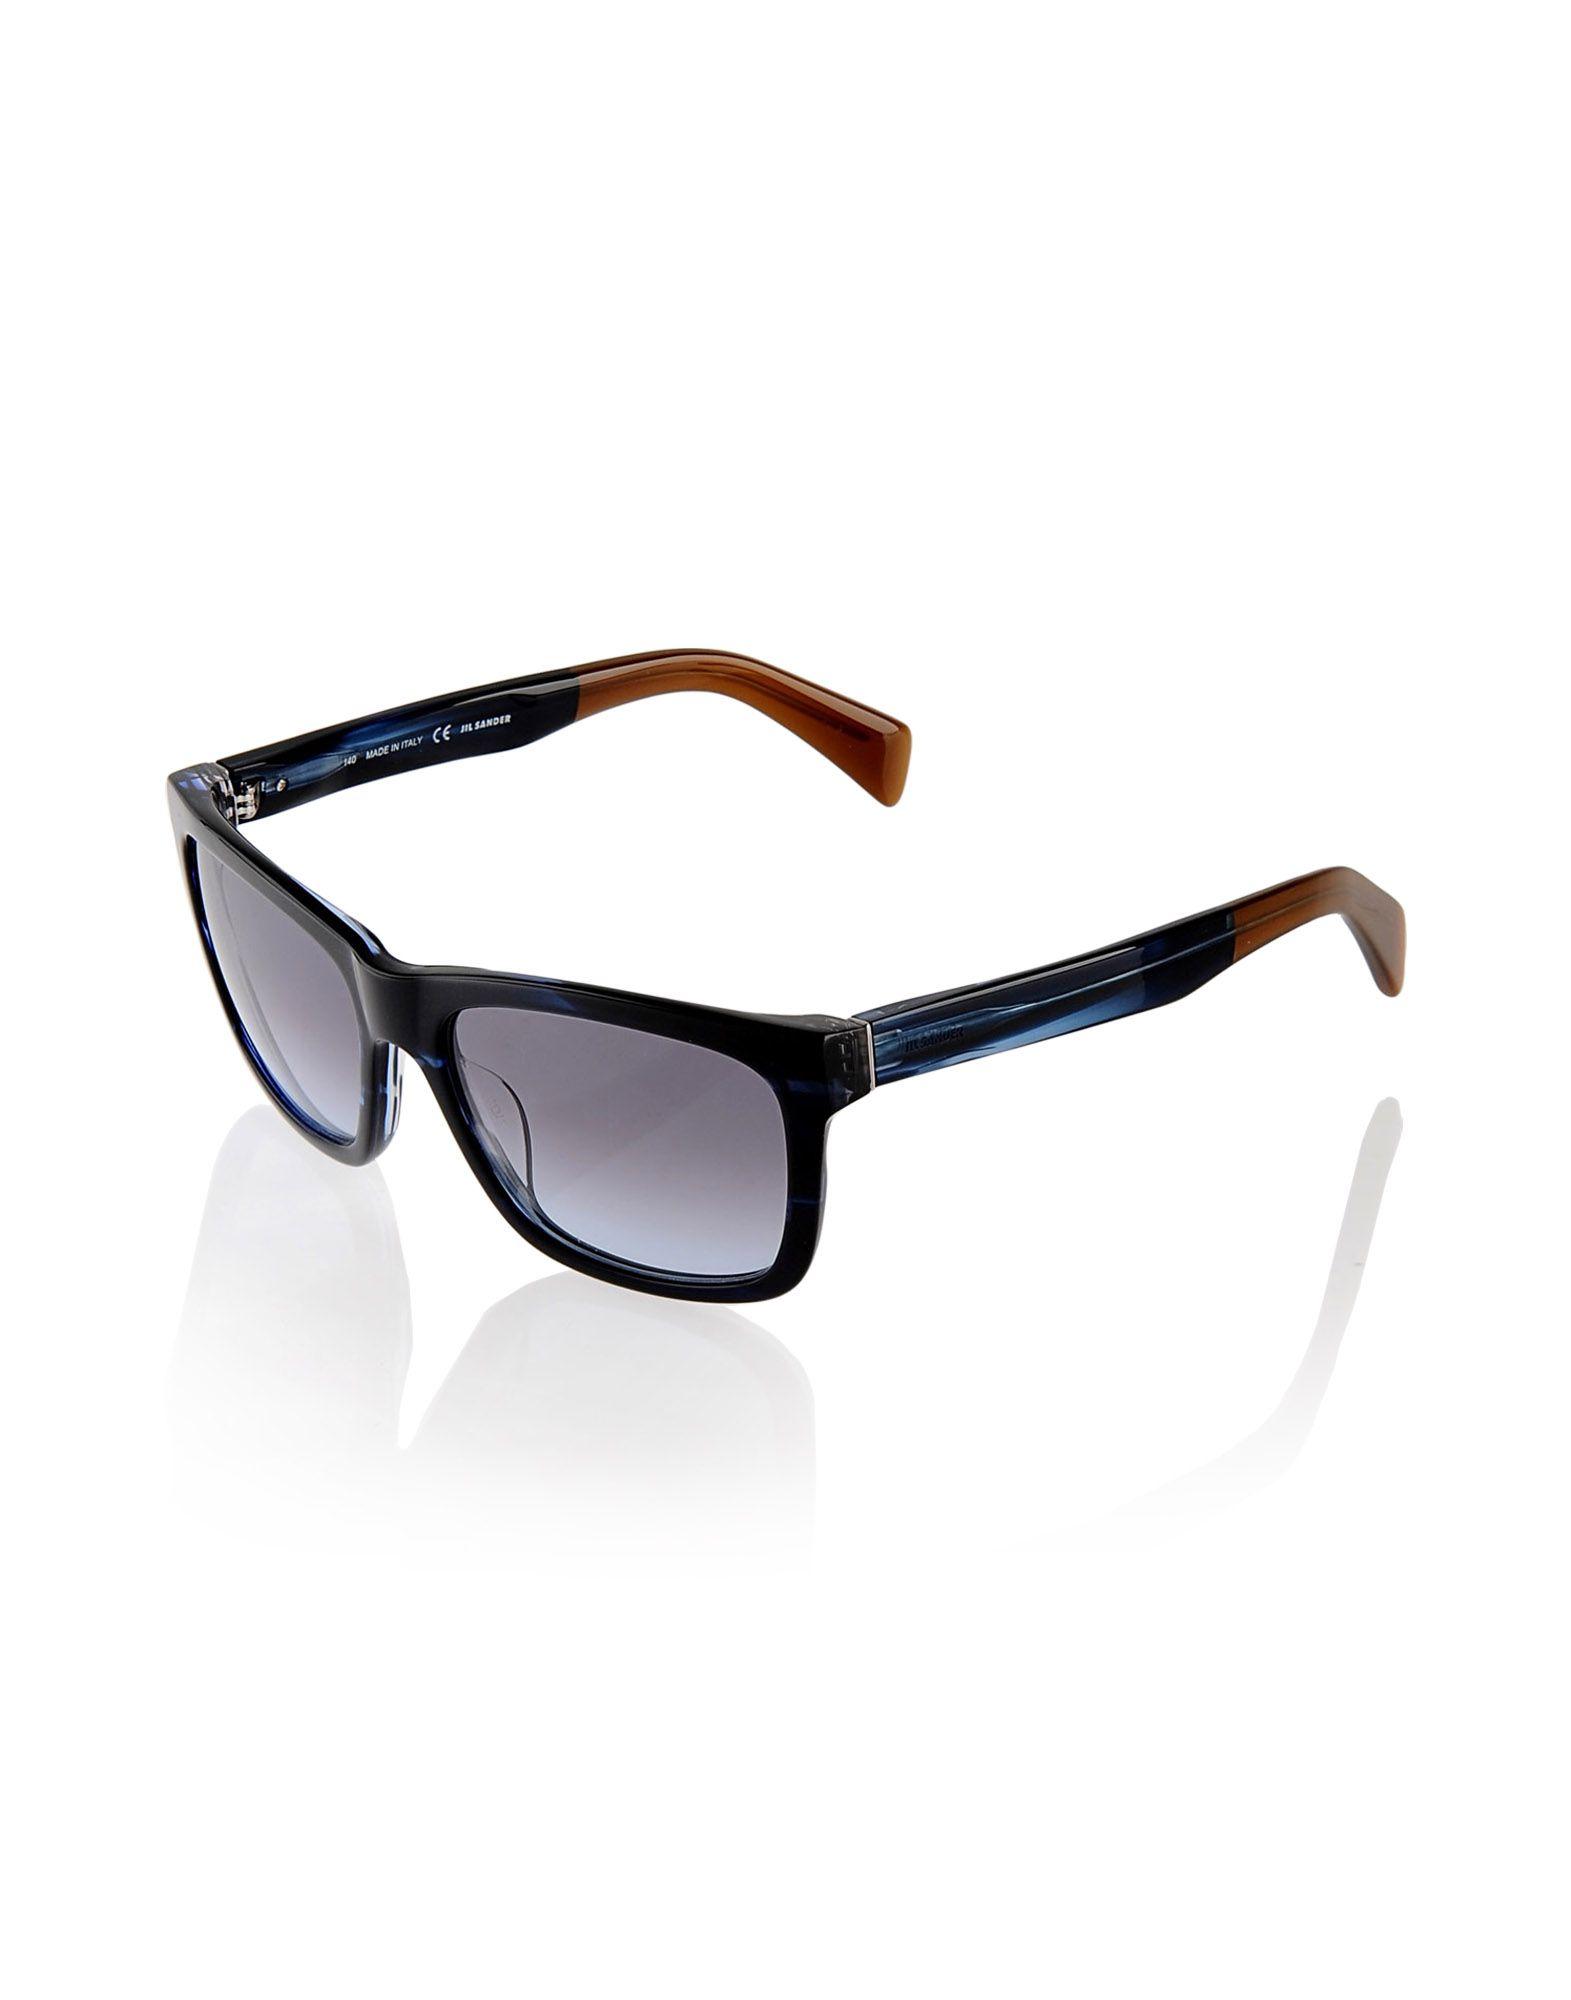 de gafas online Sander de Jil sol Tienda EwRtUqw